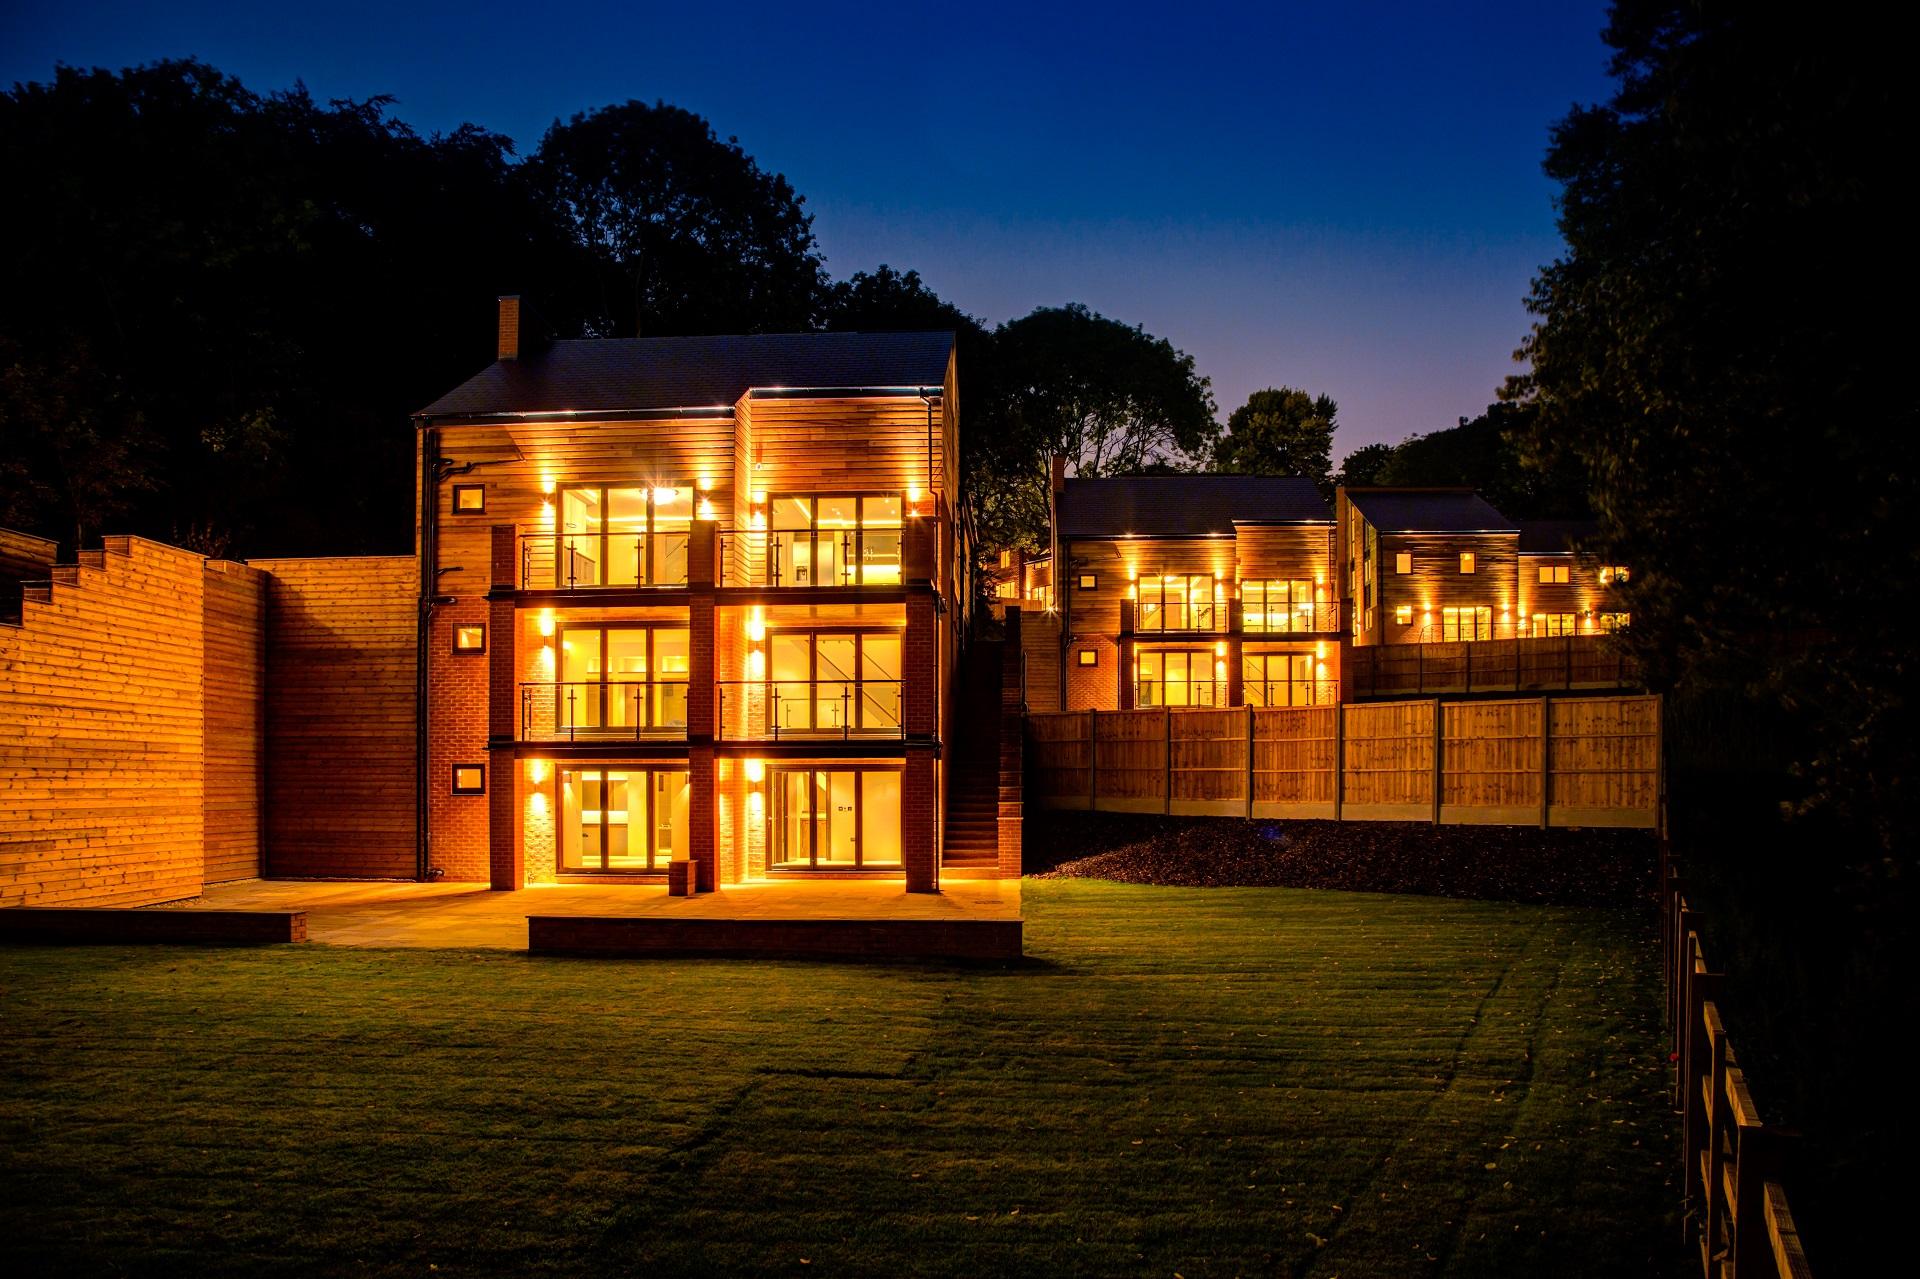 Luxury executive housing development, the crescent, nottingham